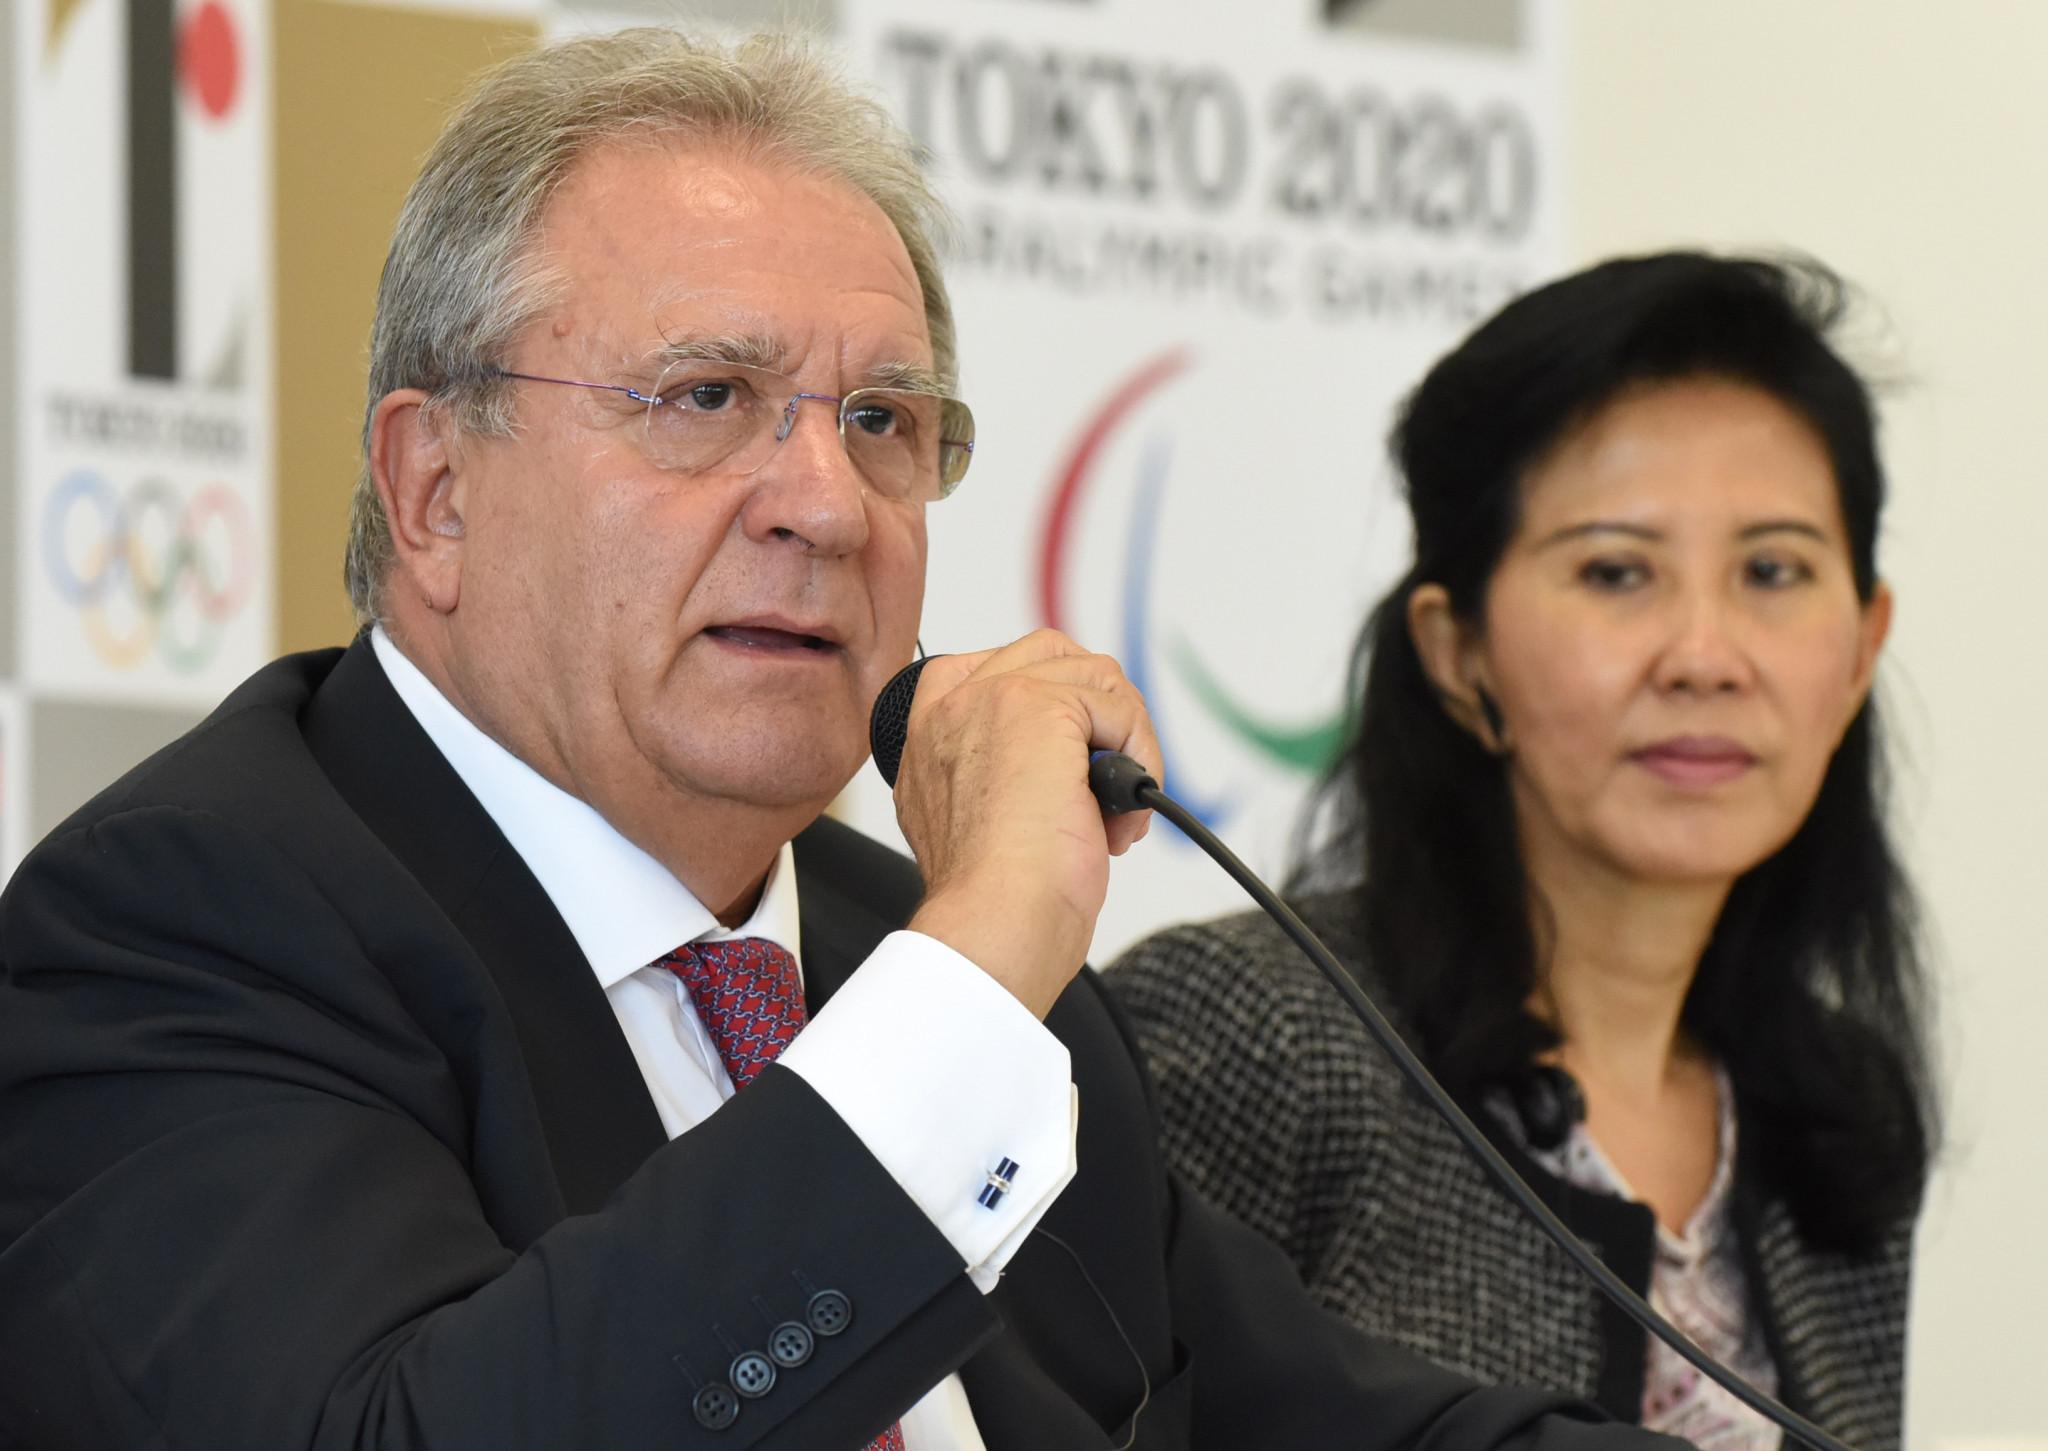 WBSC President Fraccari receives Italian National Olympic Committee's highest honour